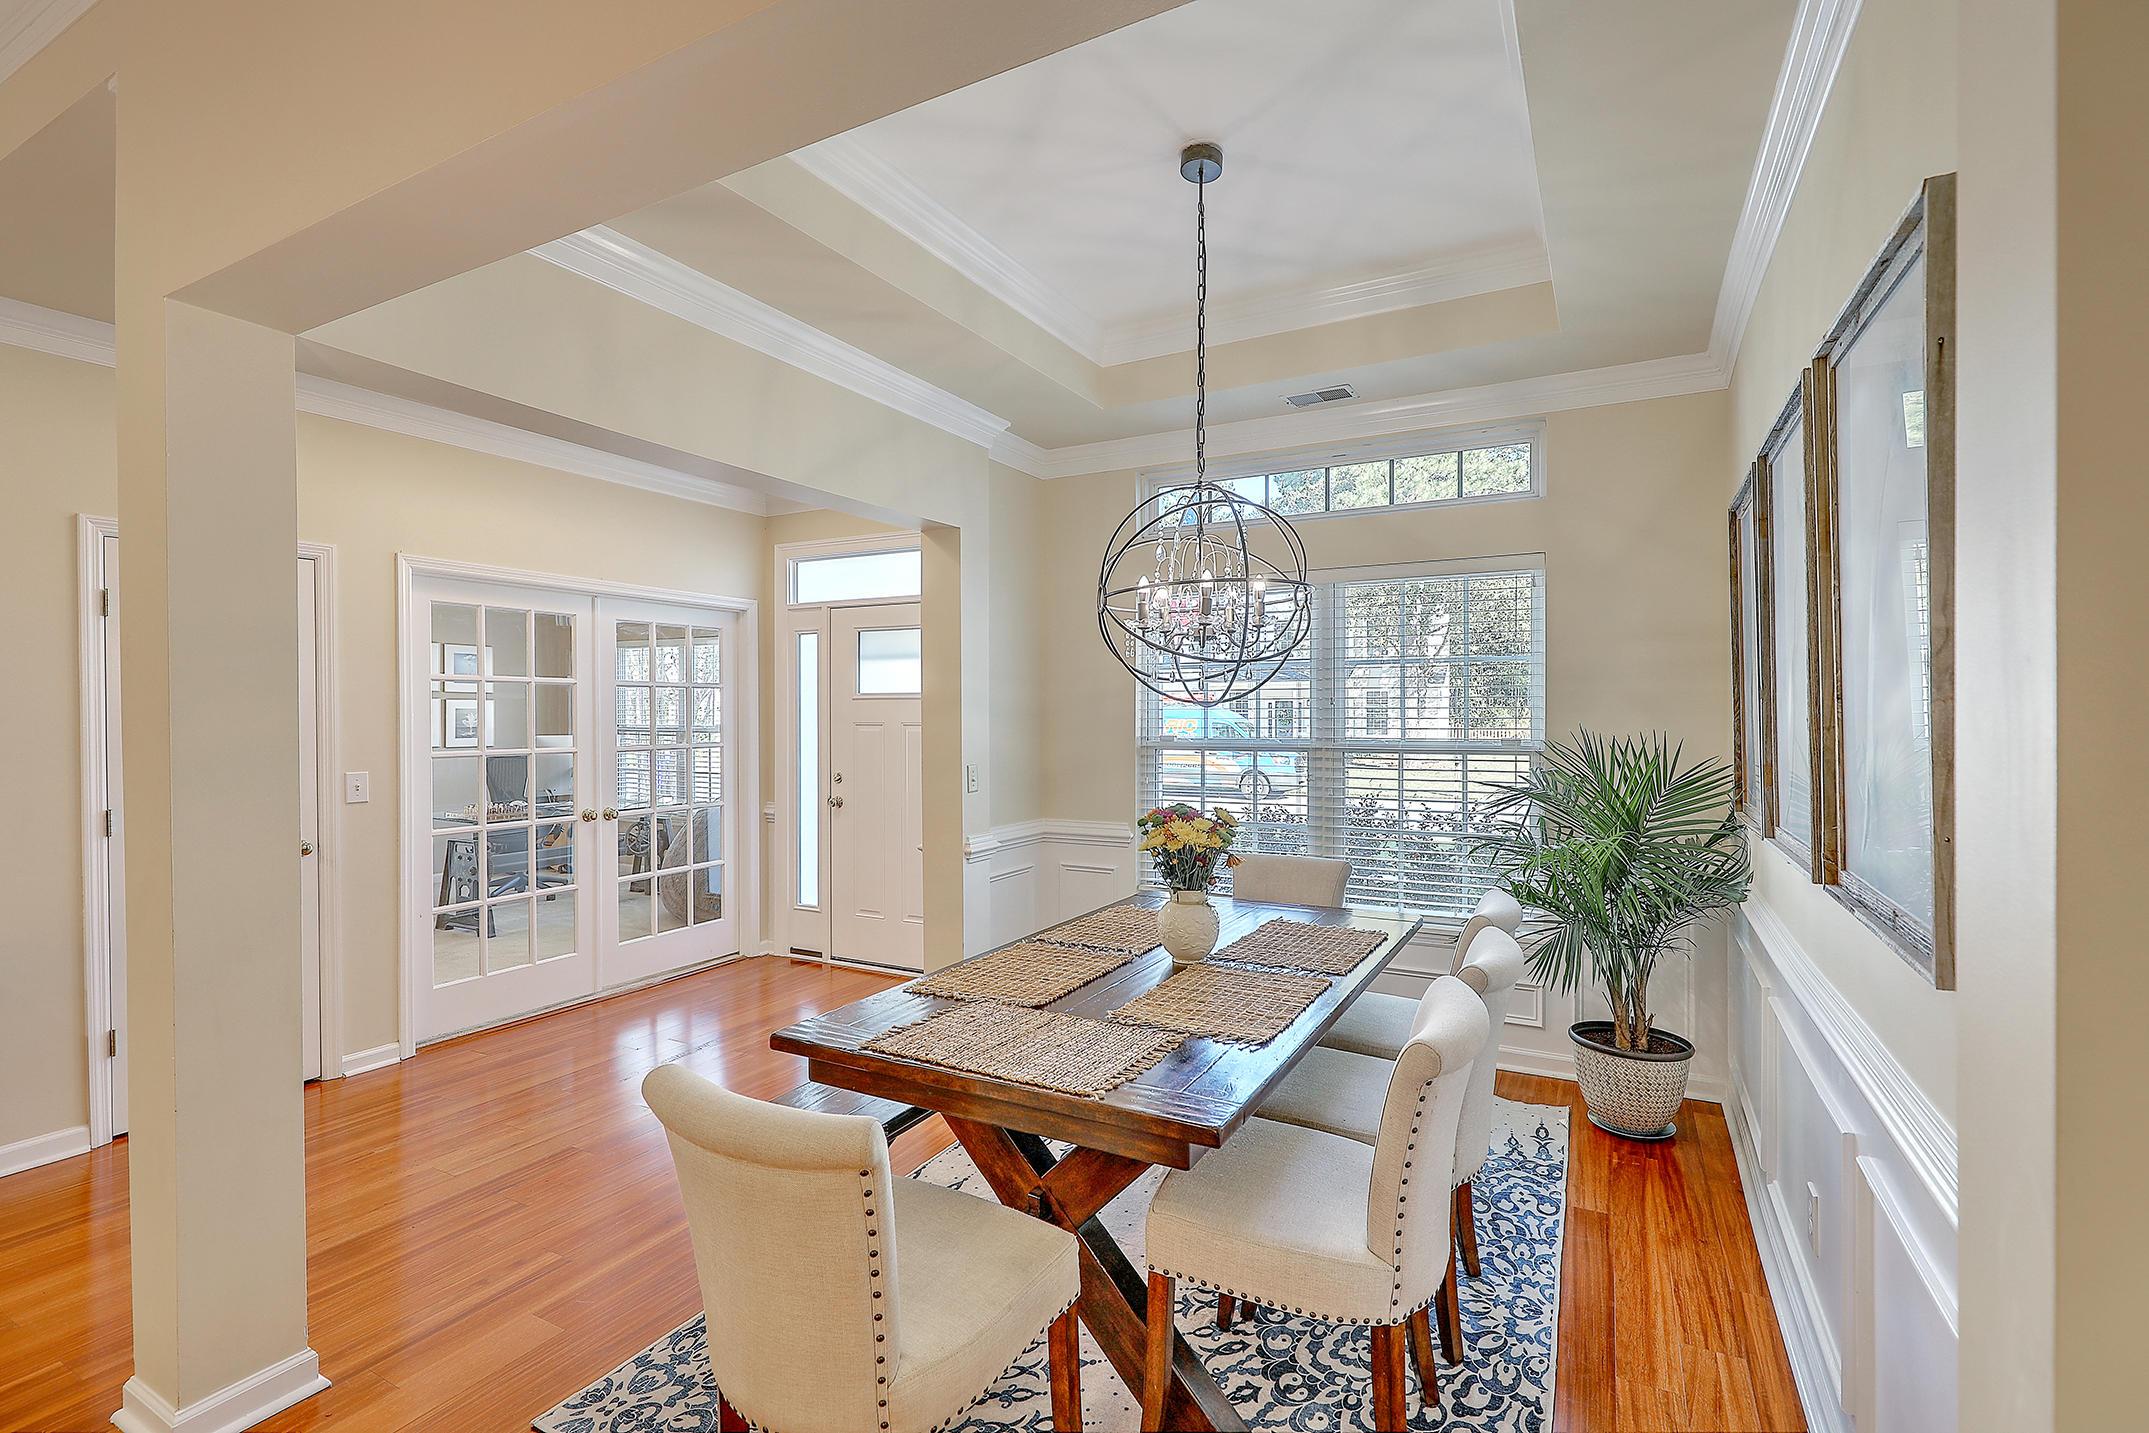 Dunes West Homes For Sale - 1471 Cypress Pointe, Mount Pleasant, SC - 10